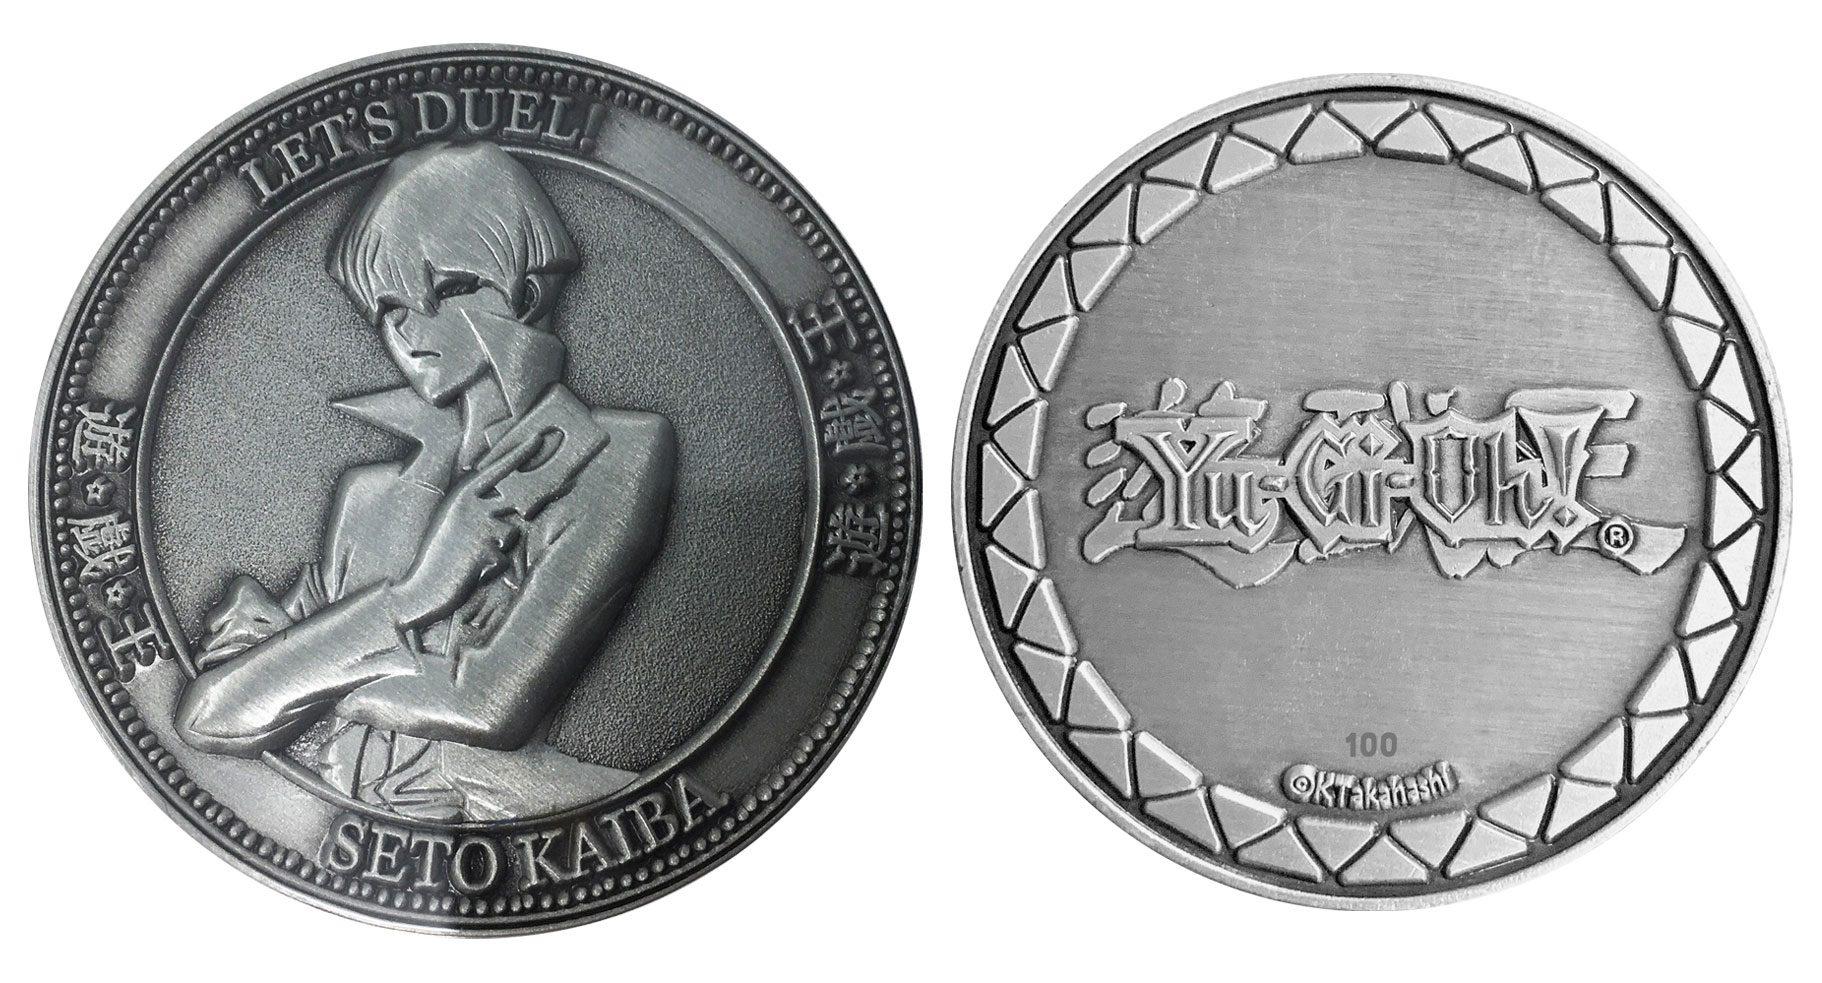 Yu-Gi-Oh! Collectable Coin Kaiba